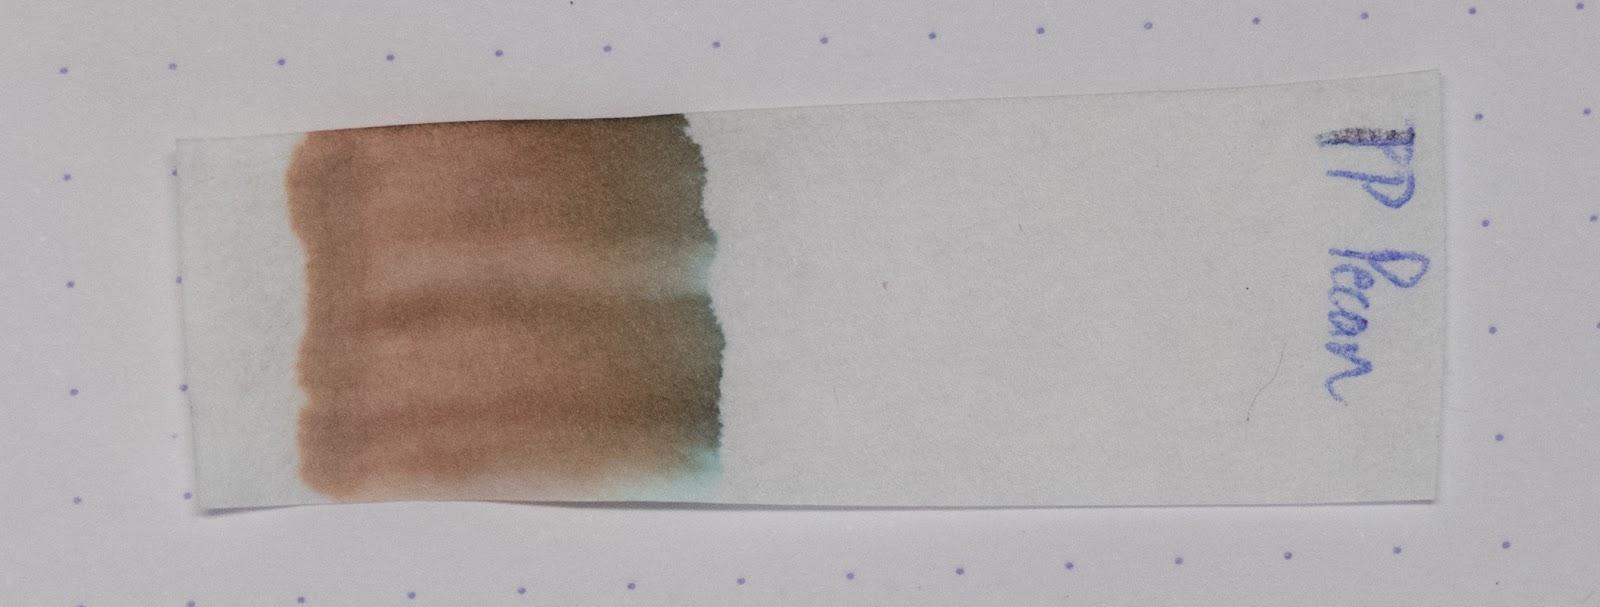 Papier Plume Pecan